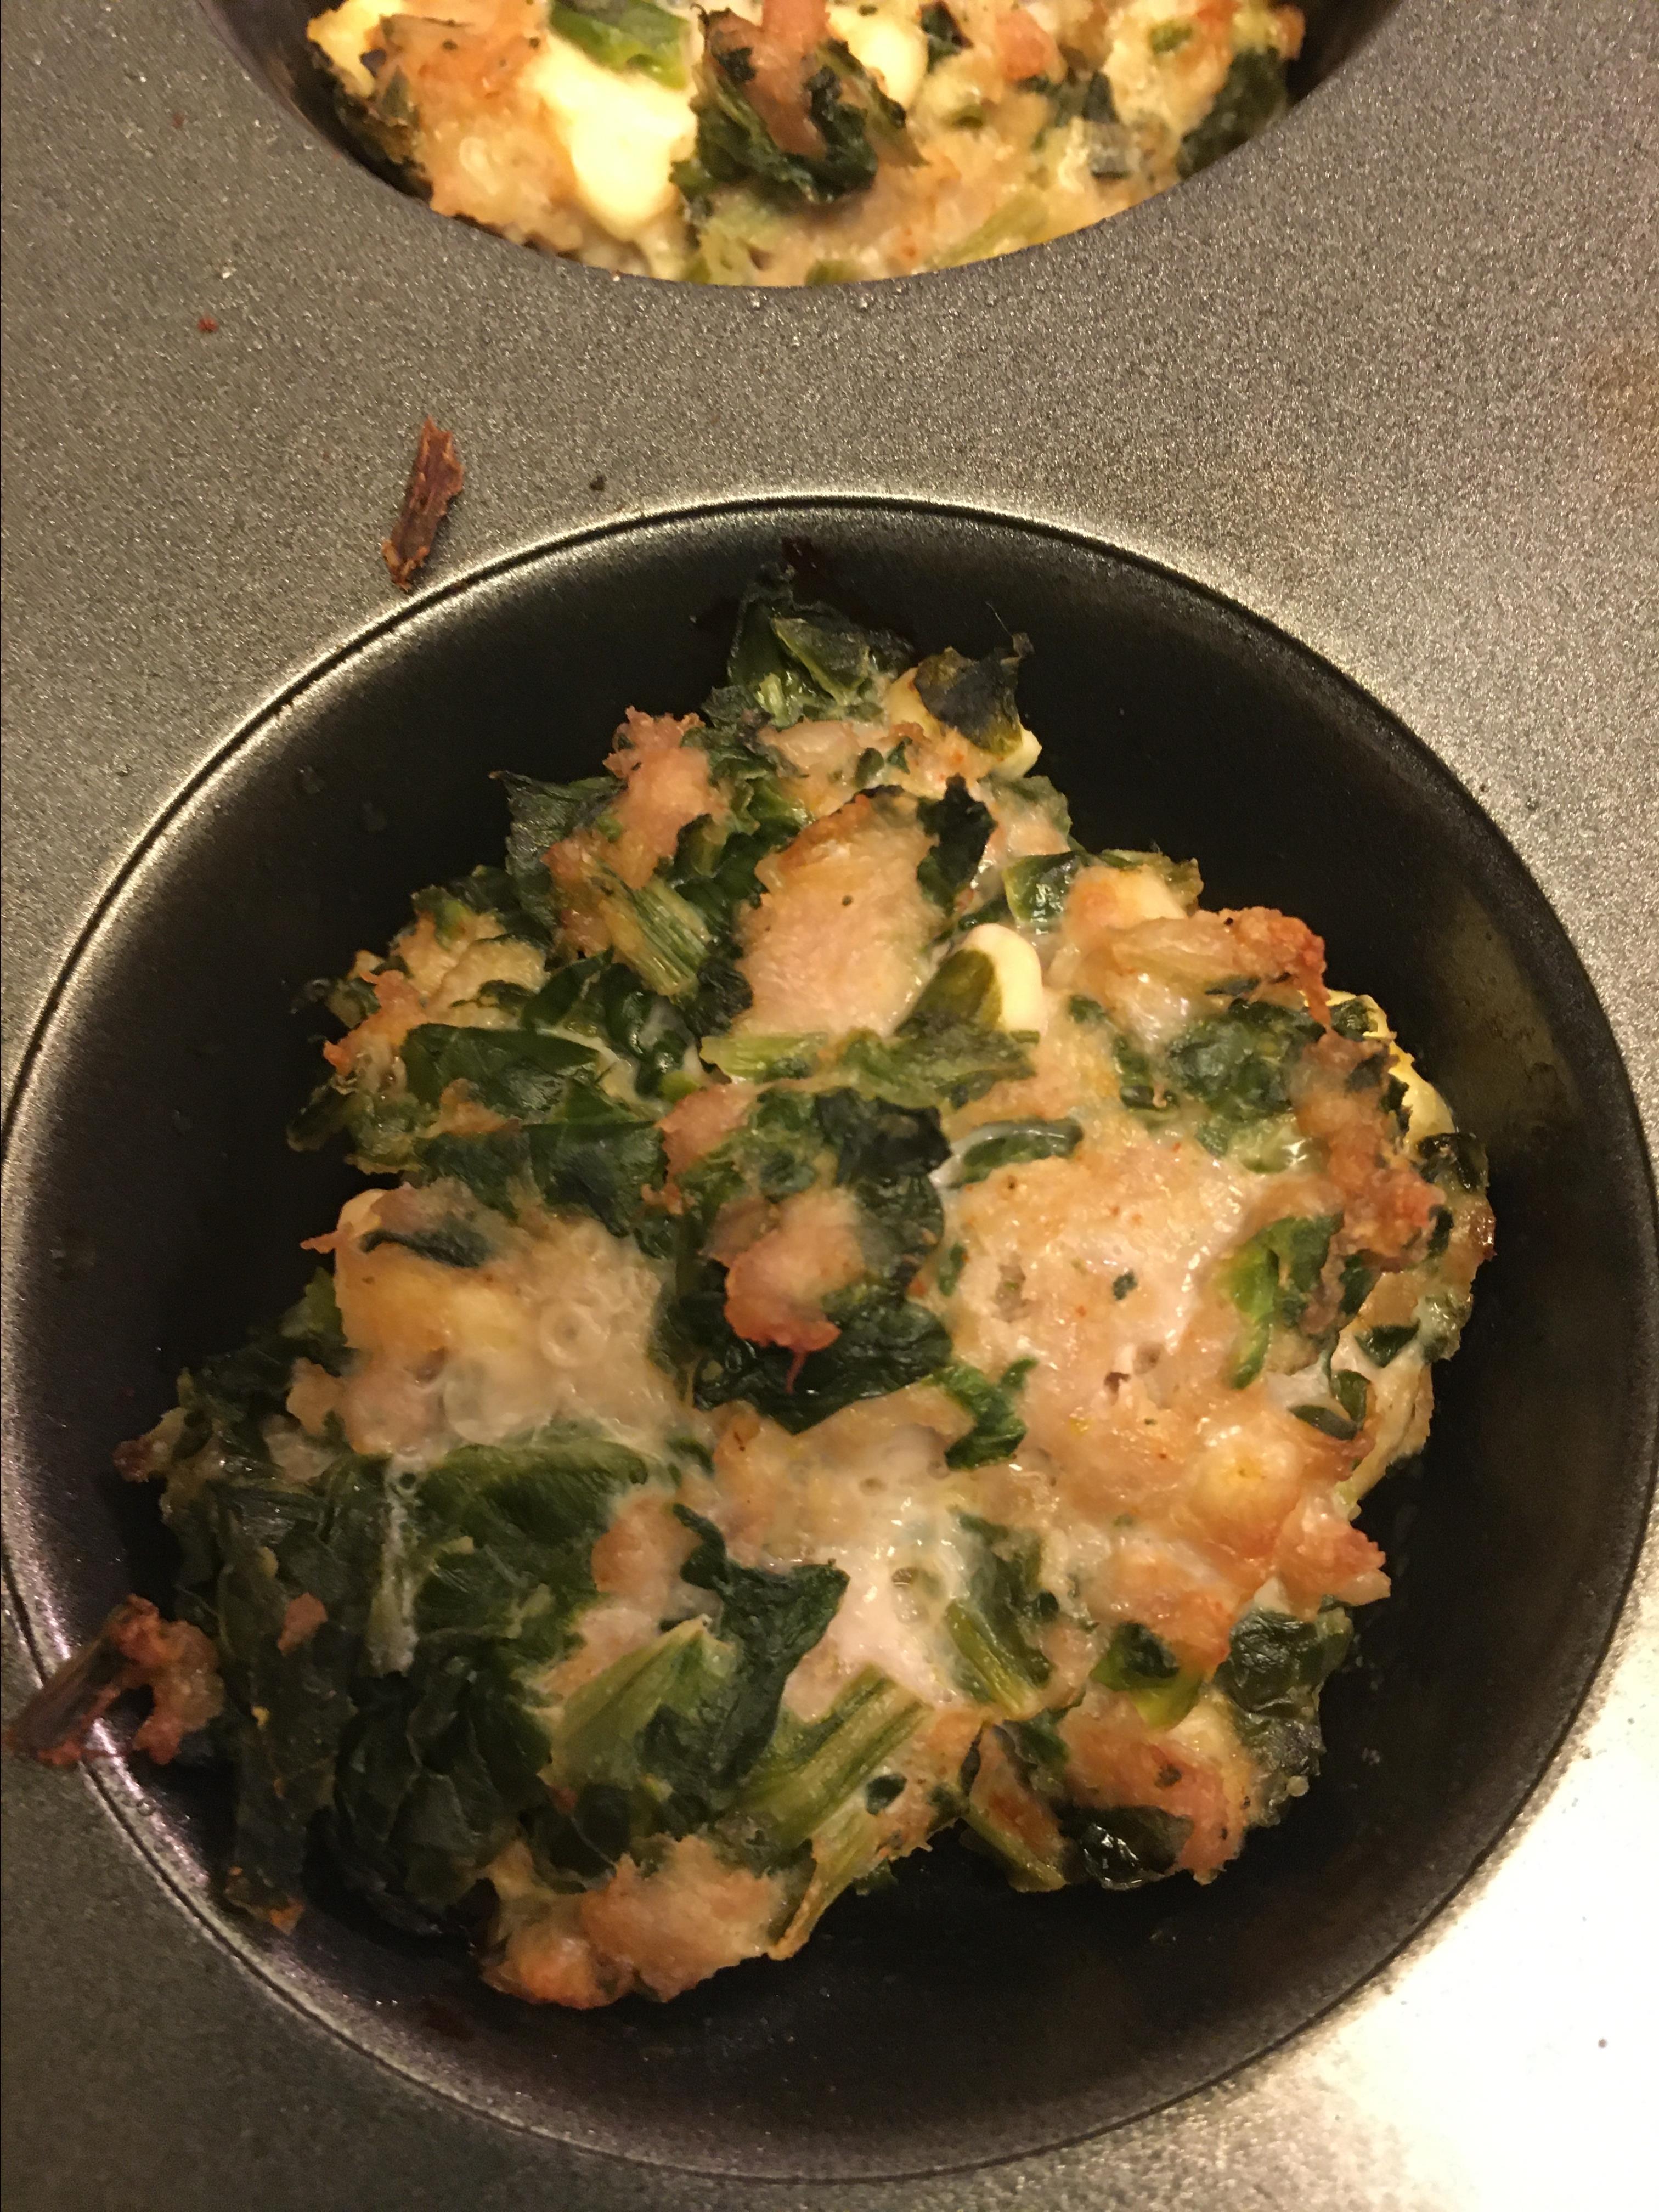 Baked Spinach, Feta, and Turkey Meatballs Allison Golde